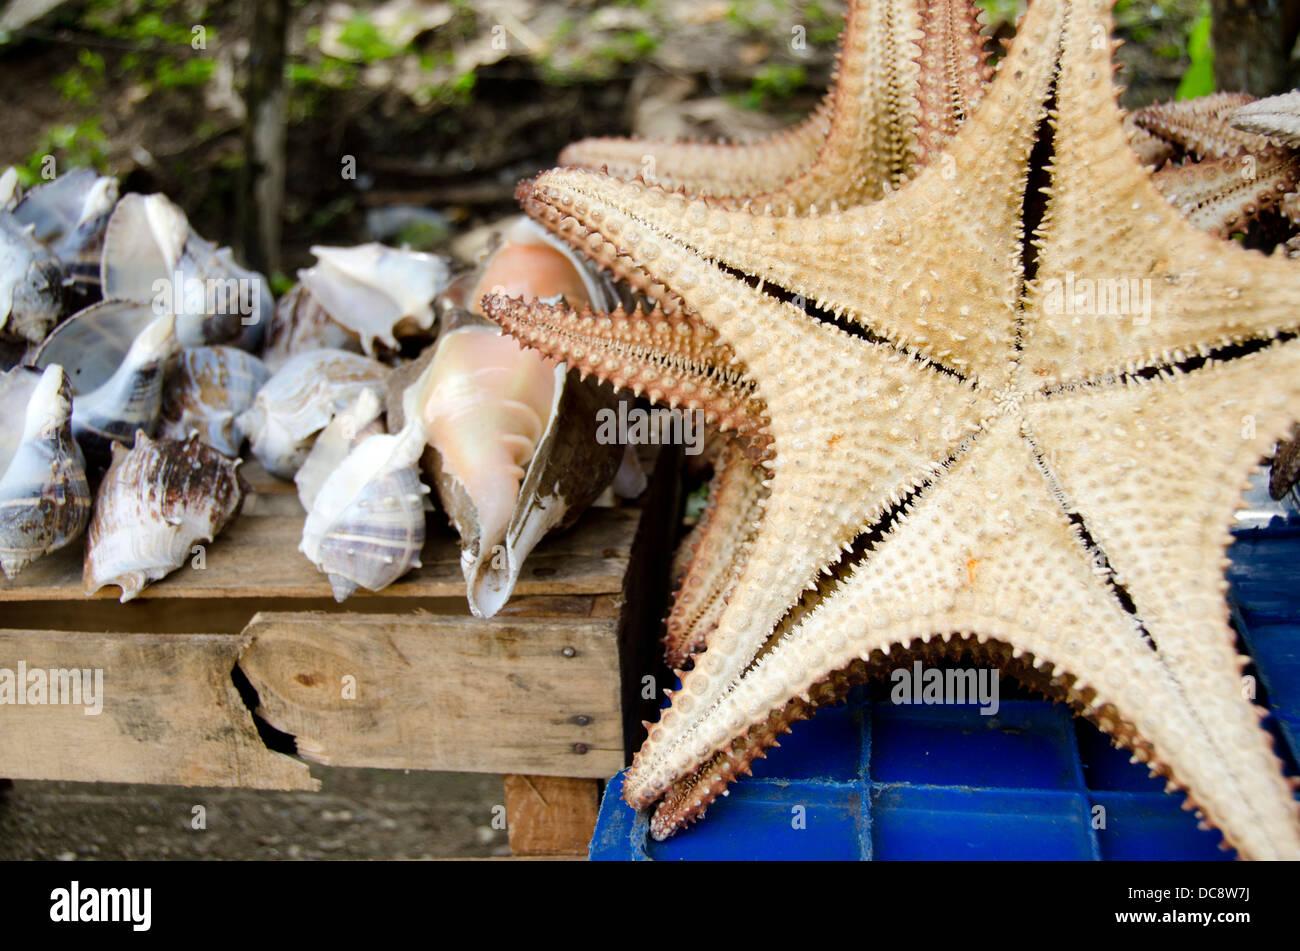 Guatemala, Livingston. Souvenir starfish (underside) and seashells for sale, typical vendor stand along the coast. - Stock Image